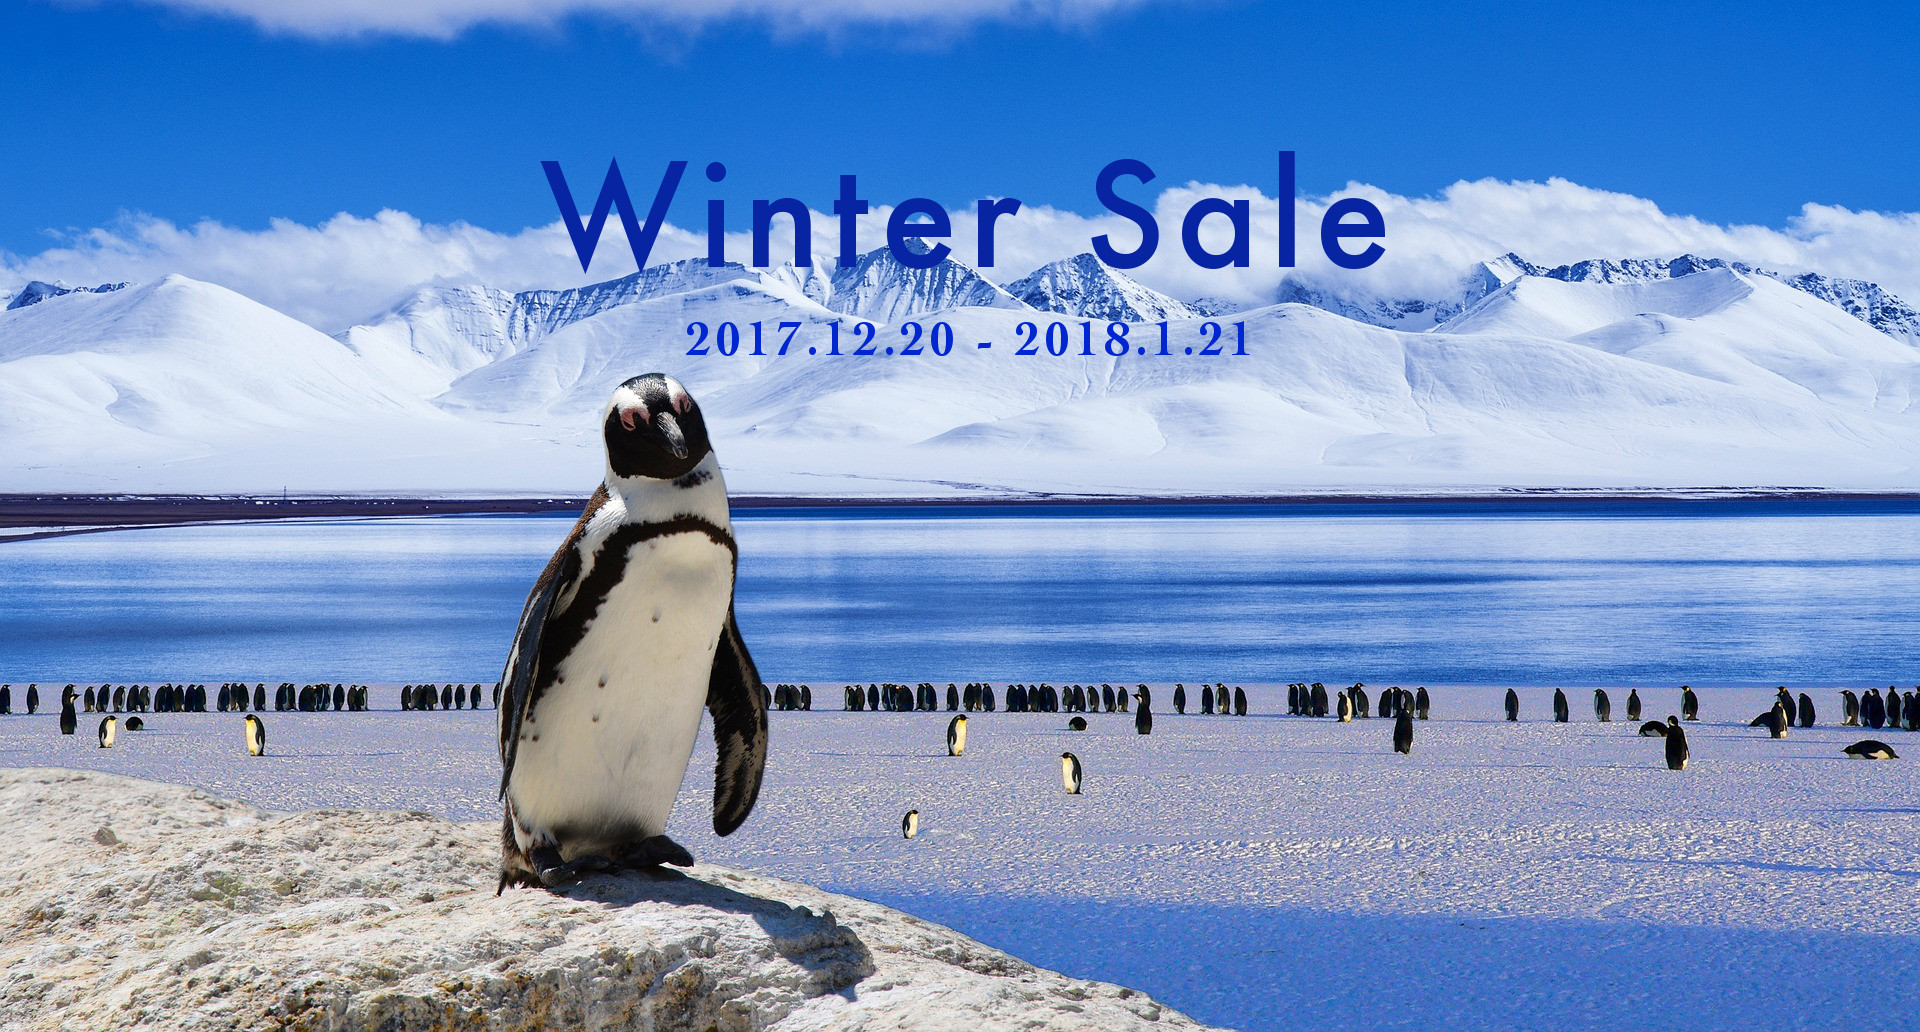 Winter Sale マリンコラーゲン10%OFF 2017-2018